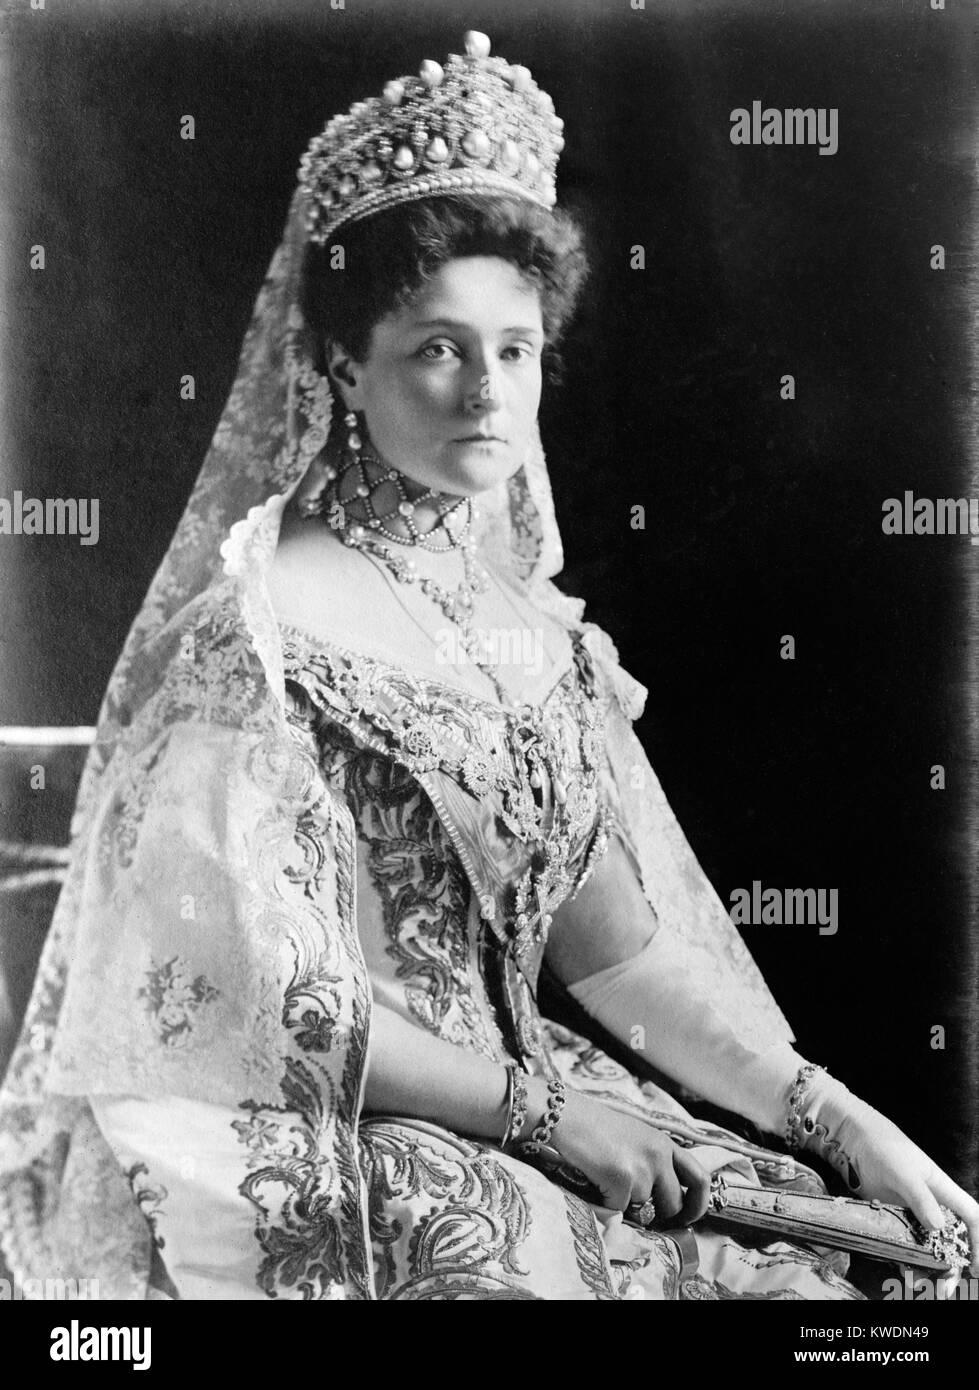 Alexandra Feodorovna, Empress of Russia, Tsaritsa Alexandra Fyodorovna - Stock Image